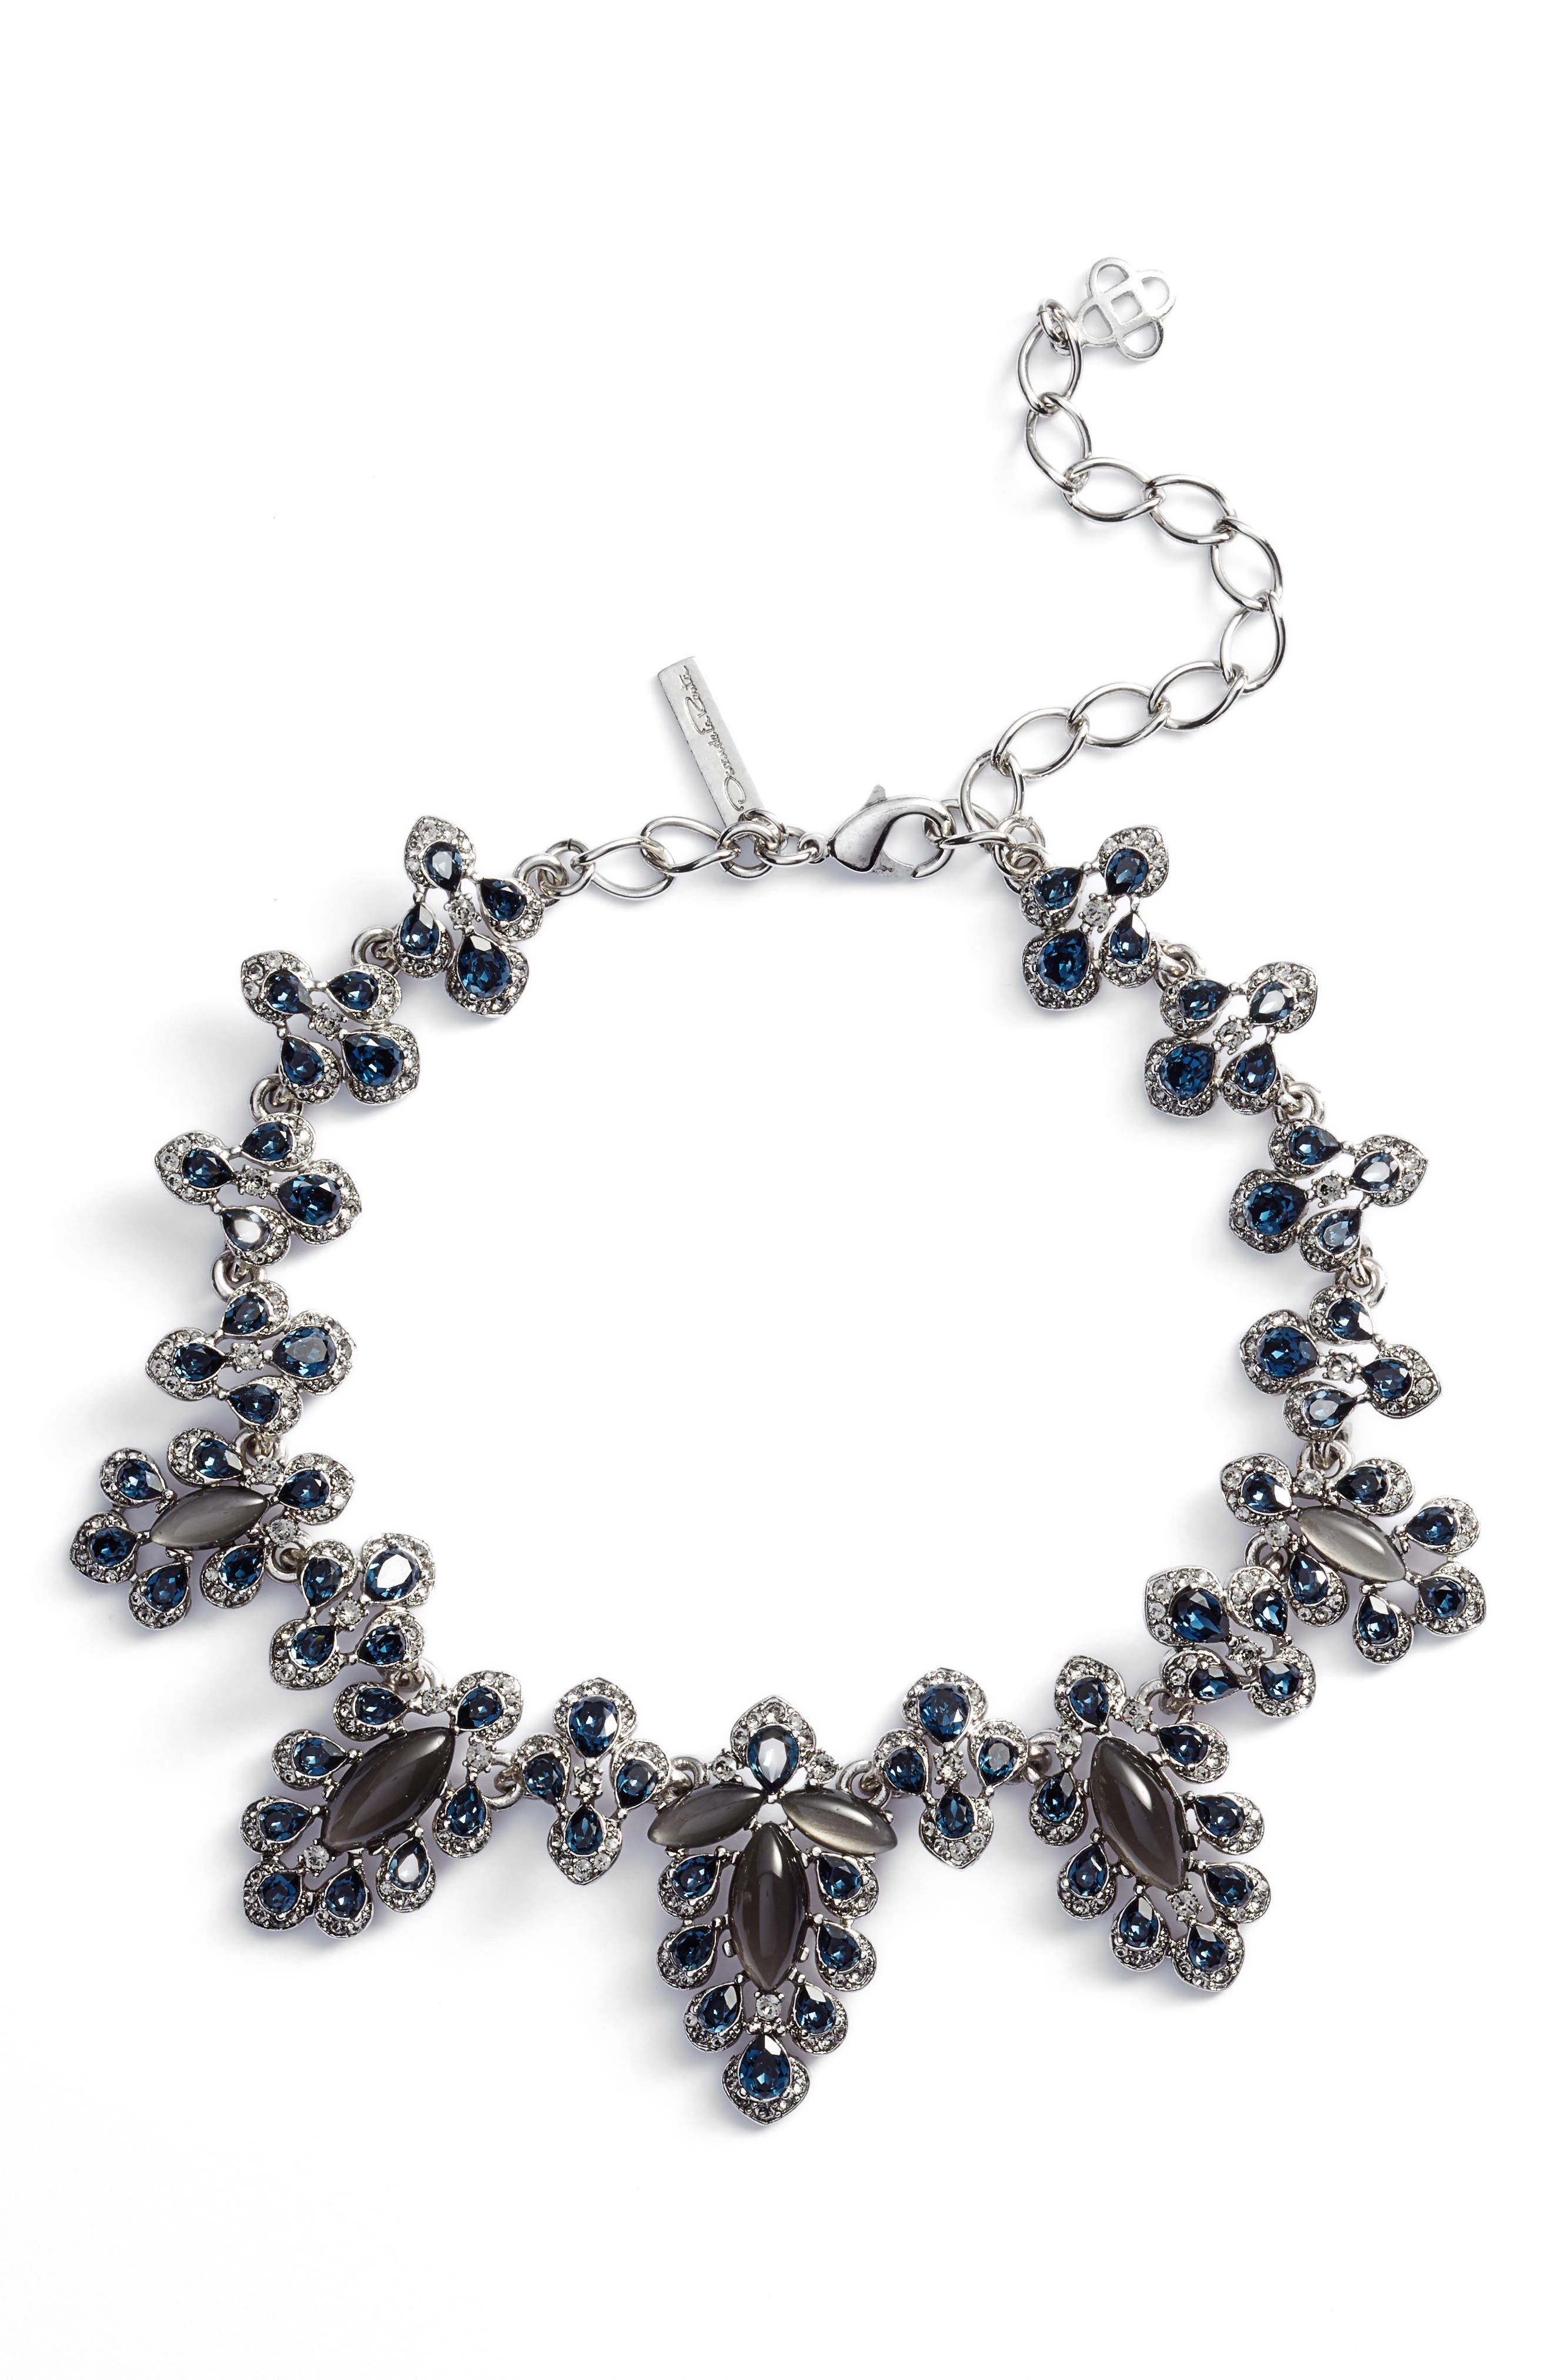 Parlor Collar Necklace,                         Main,                         color, Antique Silver